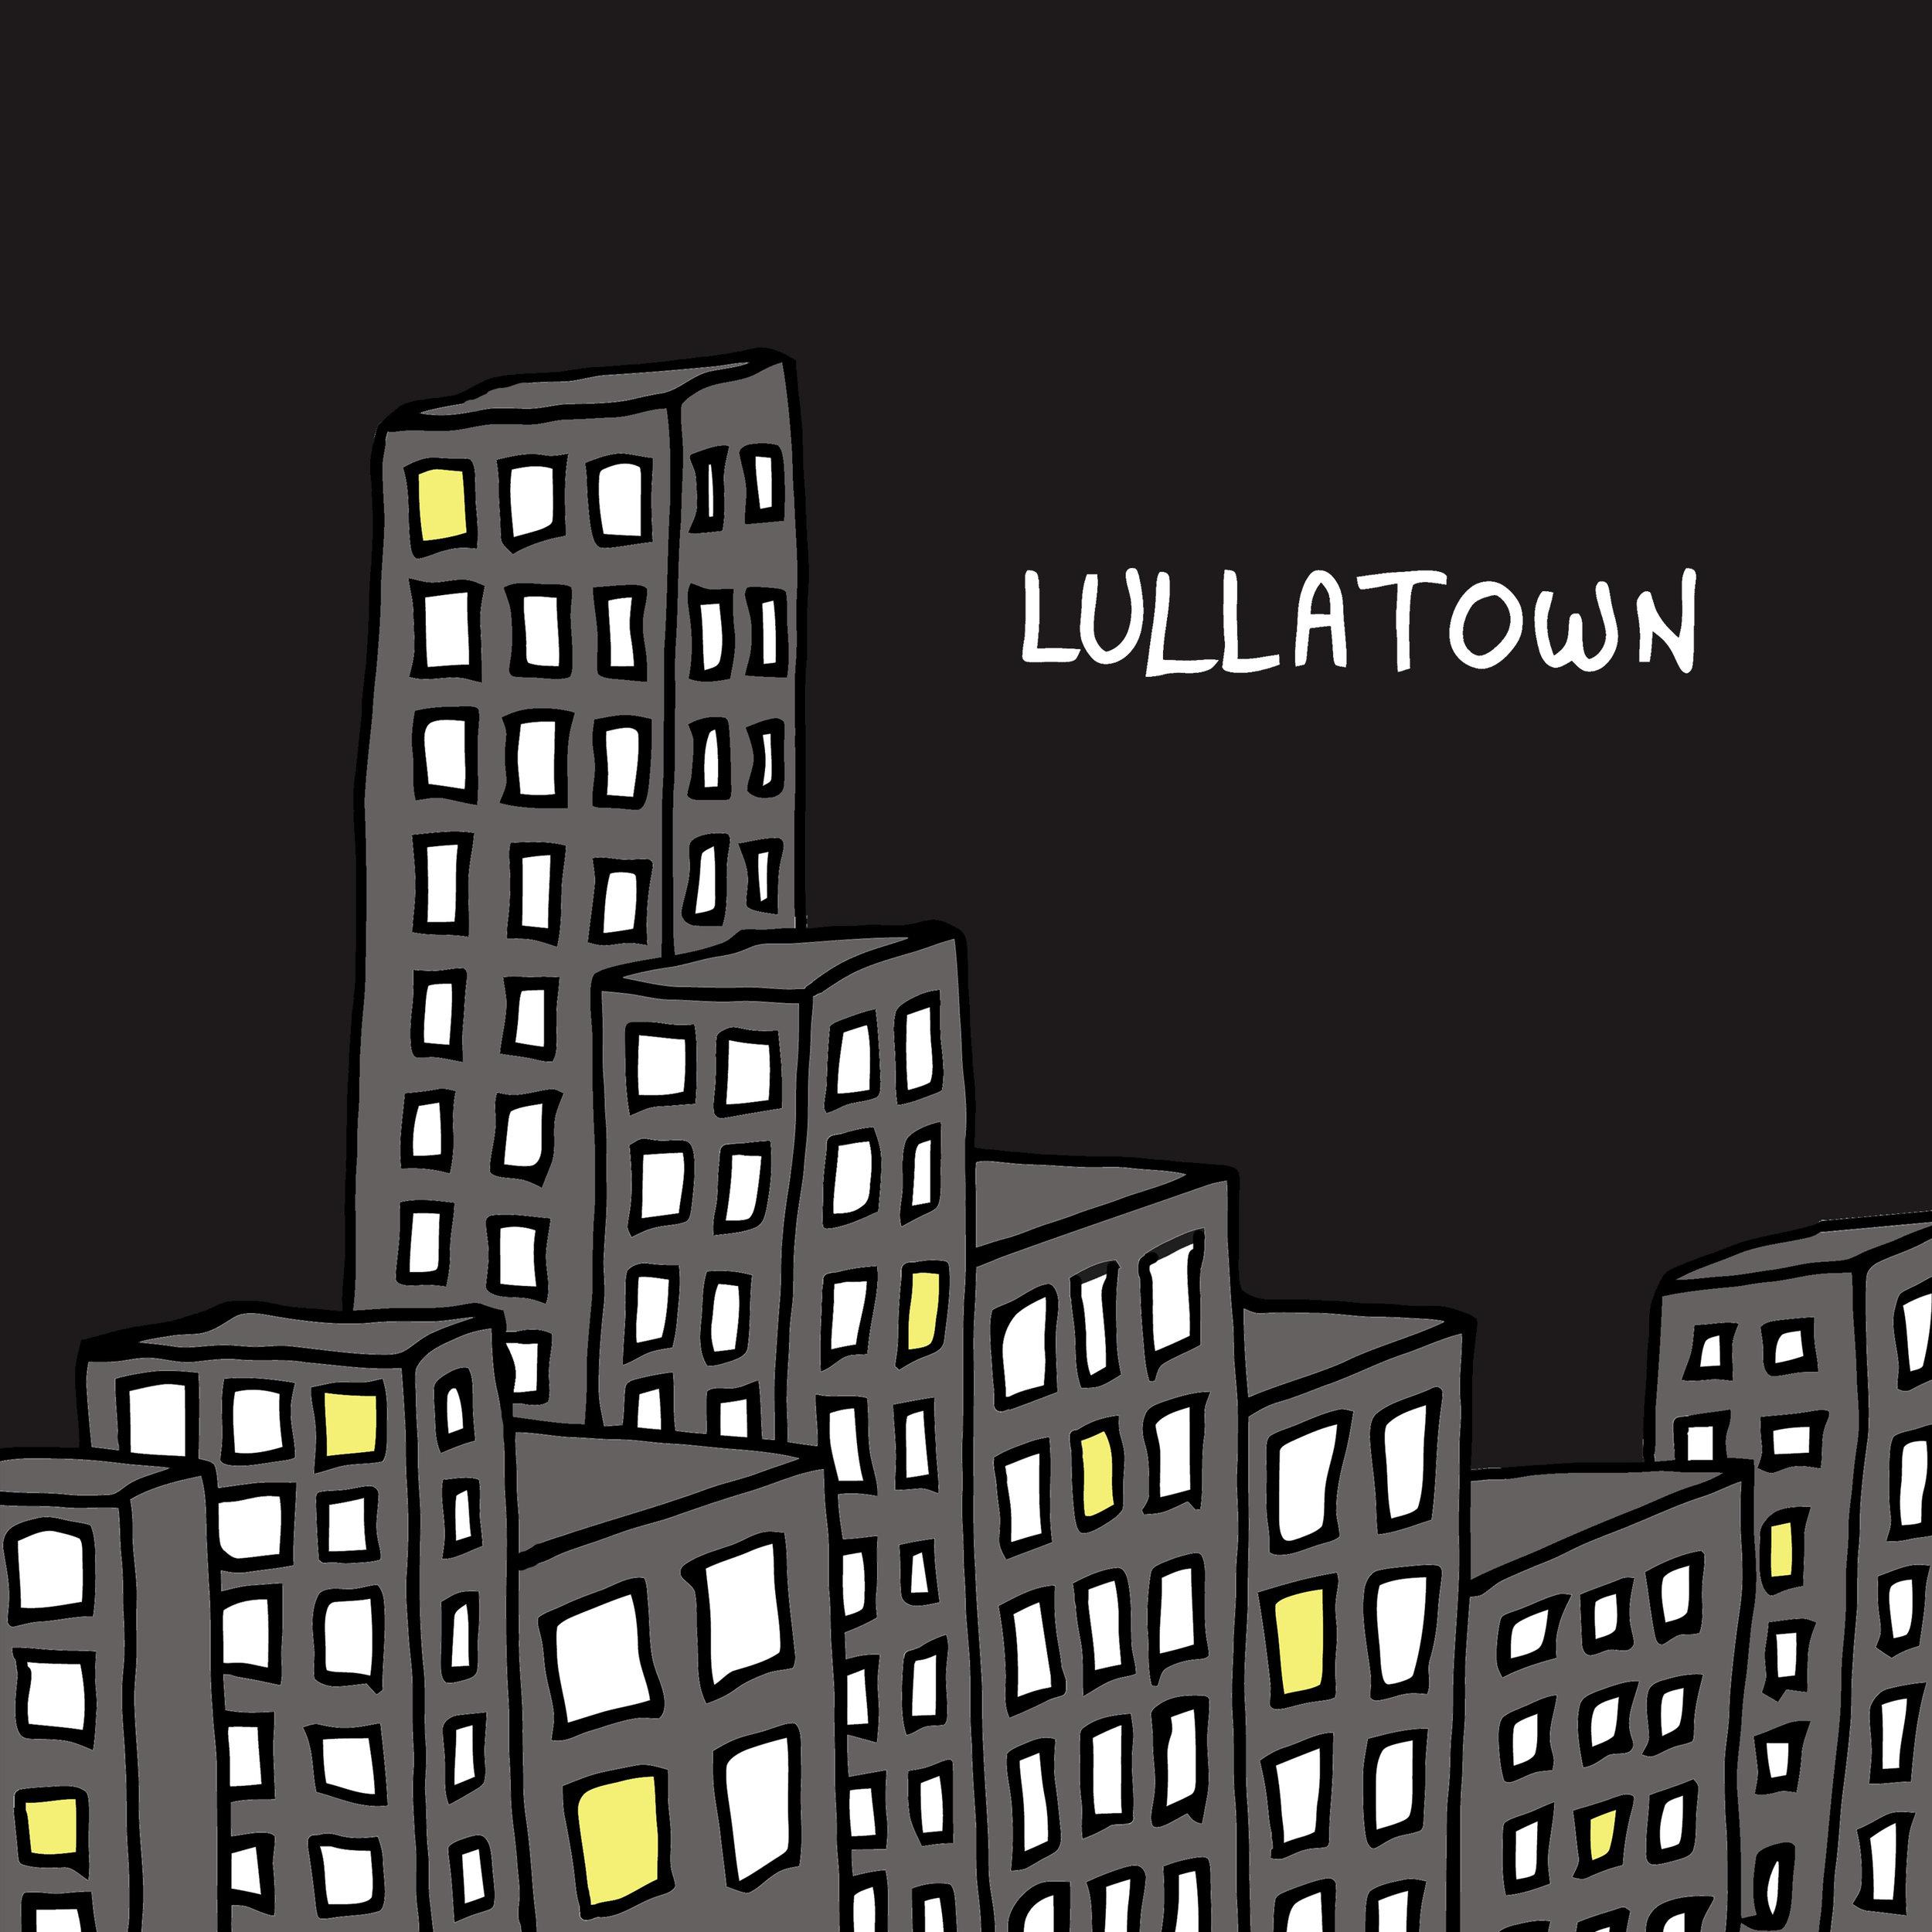 Lullatown - Lars Jakob Rudjord